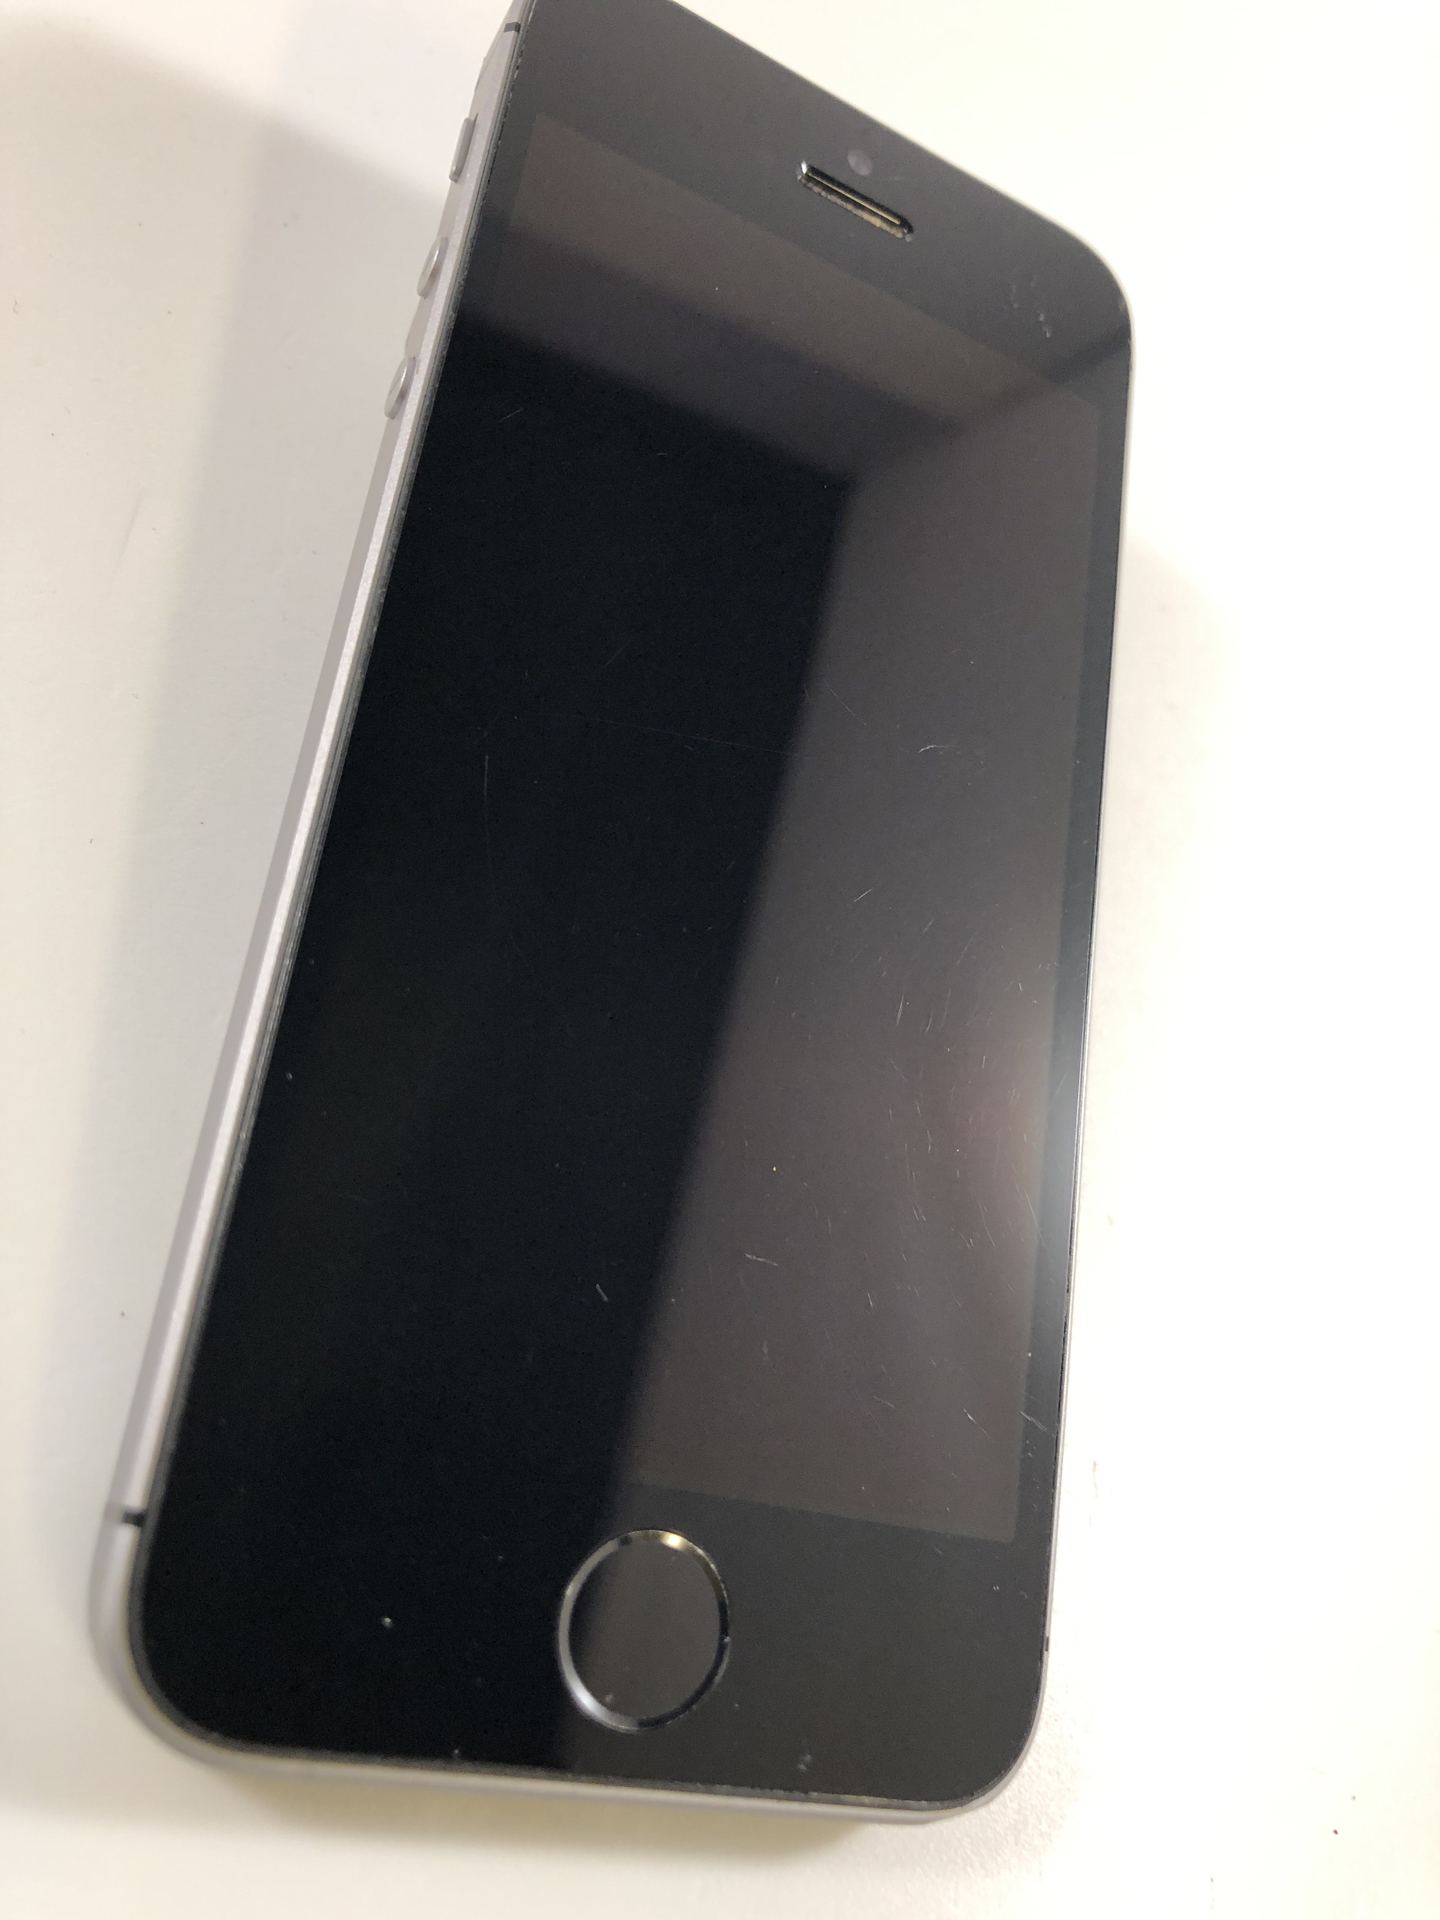 iPhone SE 16GB, 16GB, Space Gray, bild 5